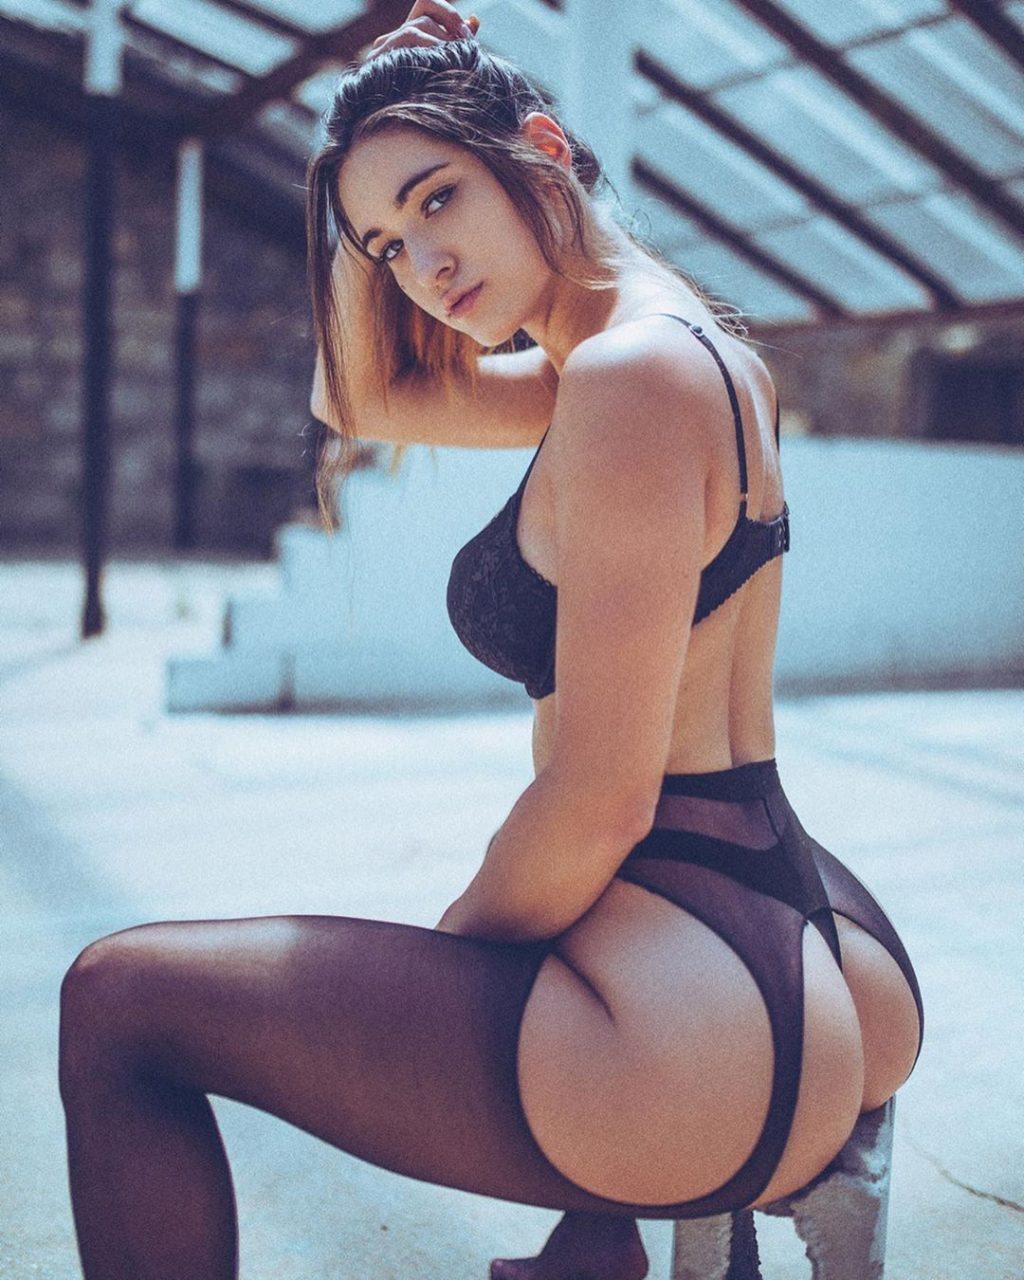 Natalie Roush Hot